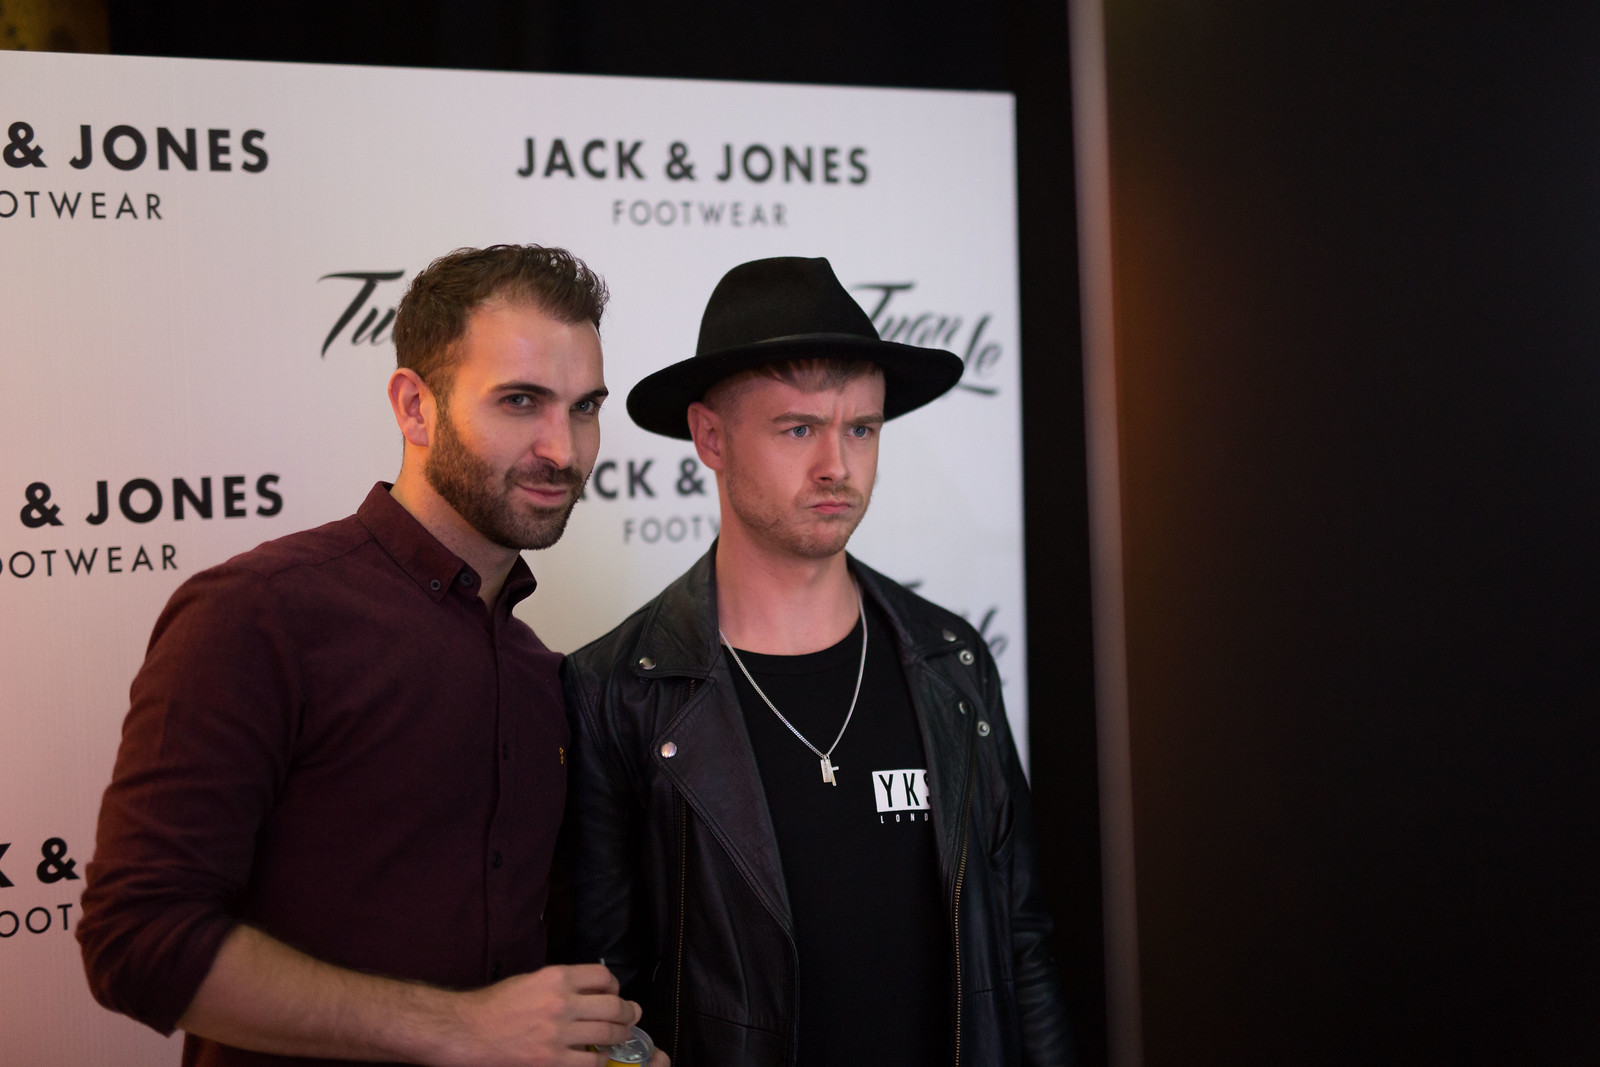 Jack & Jones Footwear x Tuan Le